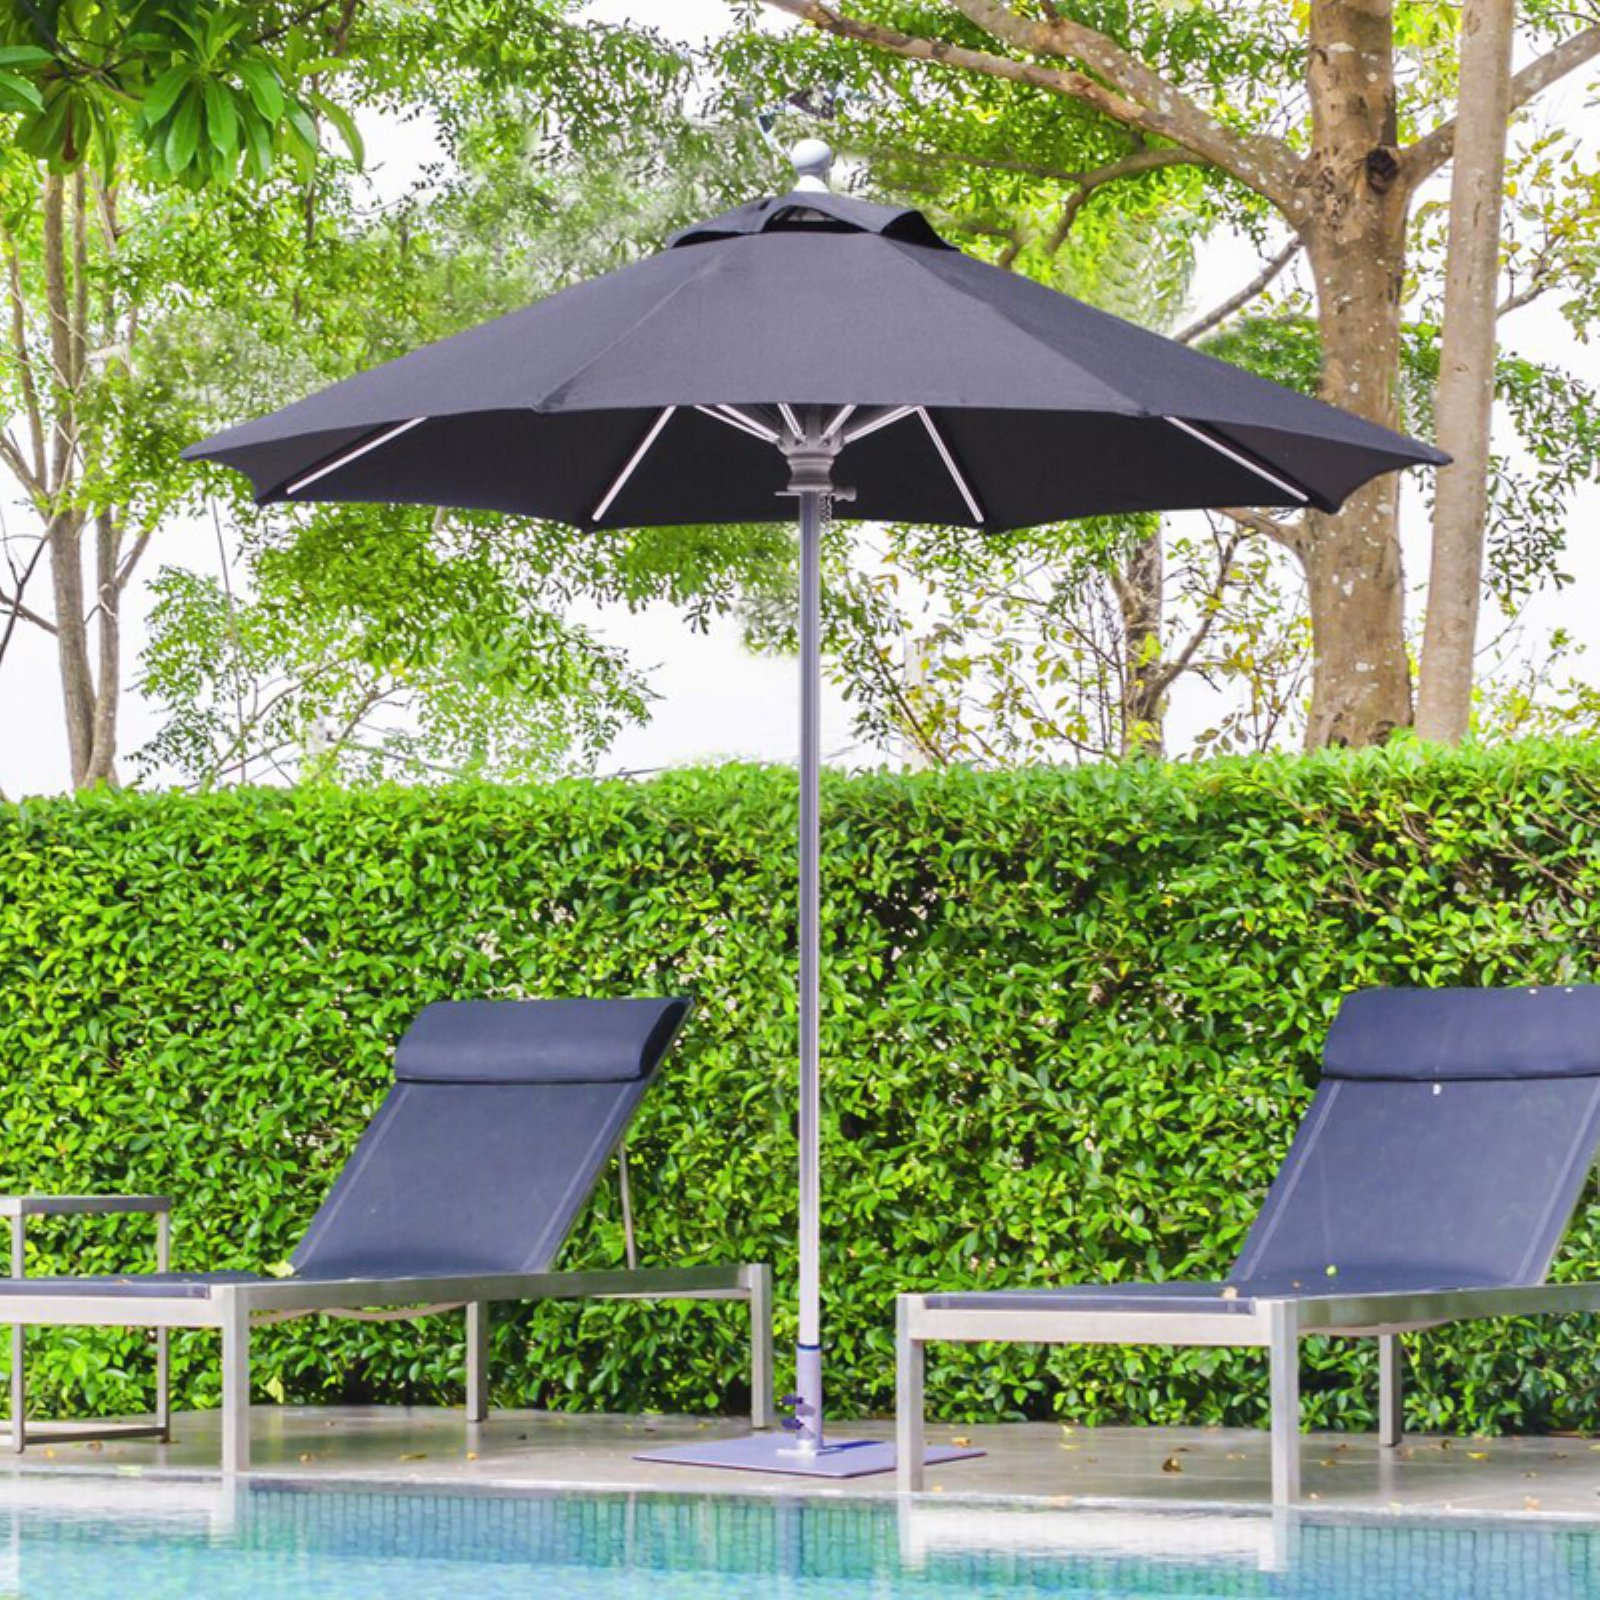 Galtech 7.5 ft. Commercial Deluxe Suncrylic Aluminum Market Umbrella